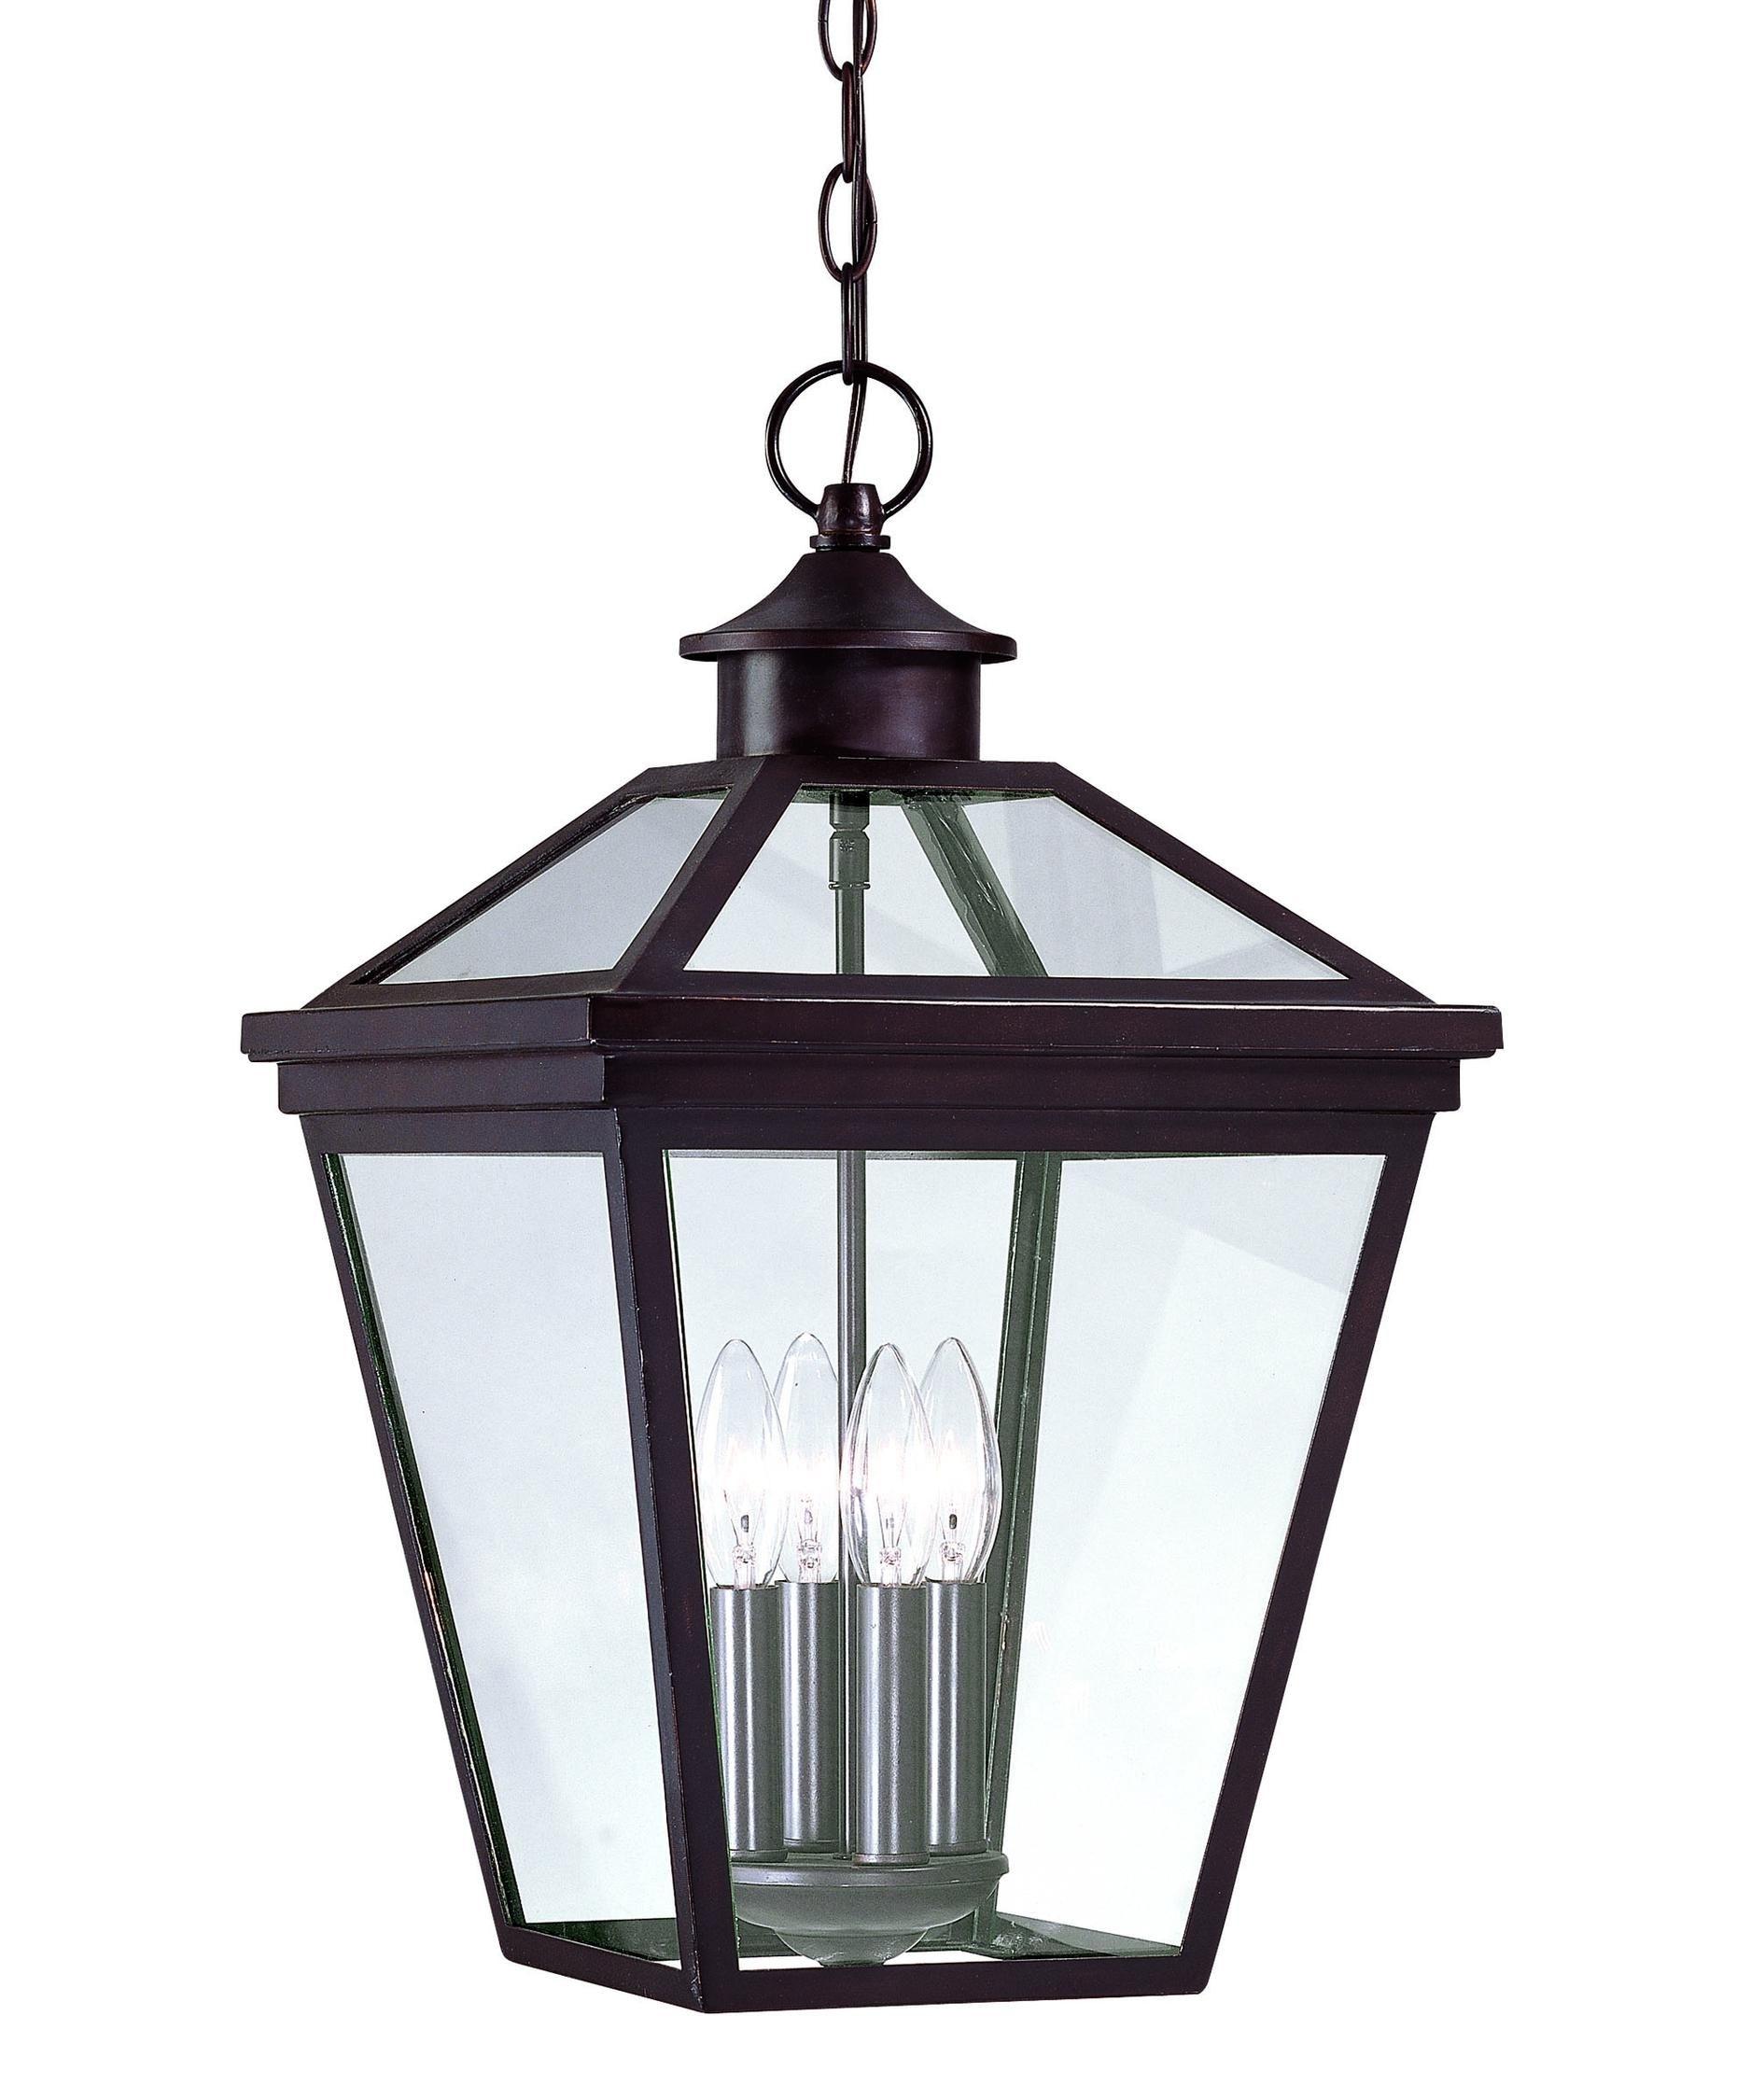 Savoy House Ellijay 4 Light Outdoor Hanging Lantern | Capitol In Outdoor Hanging Glass Lanterns (View 11 of 15)